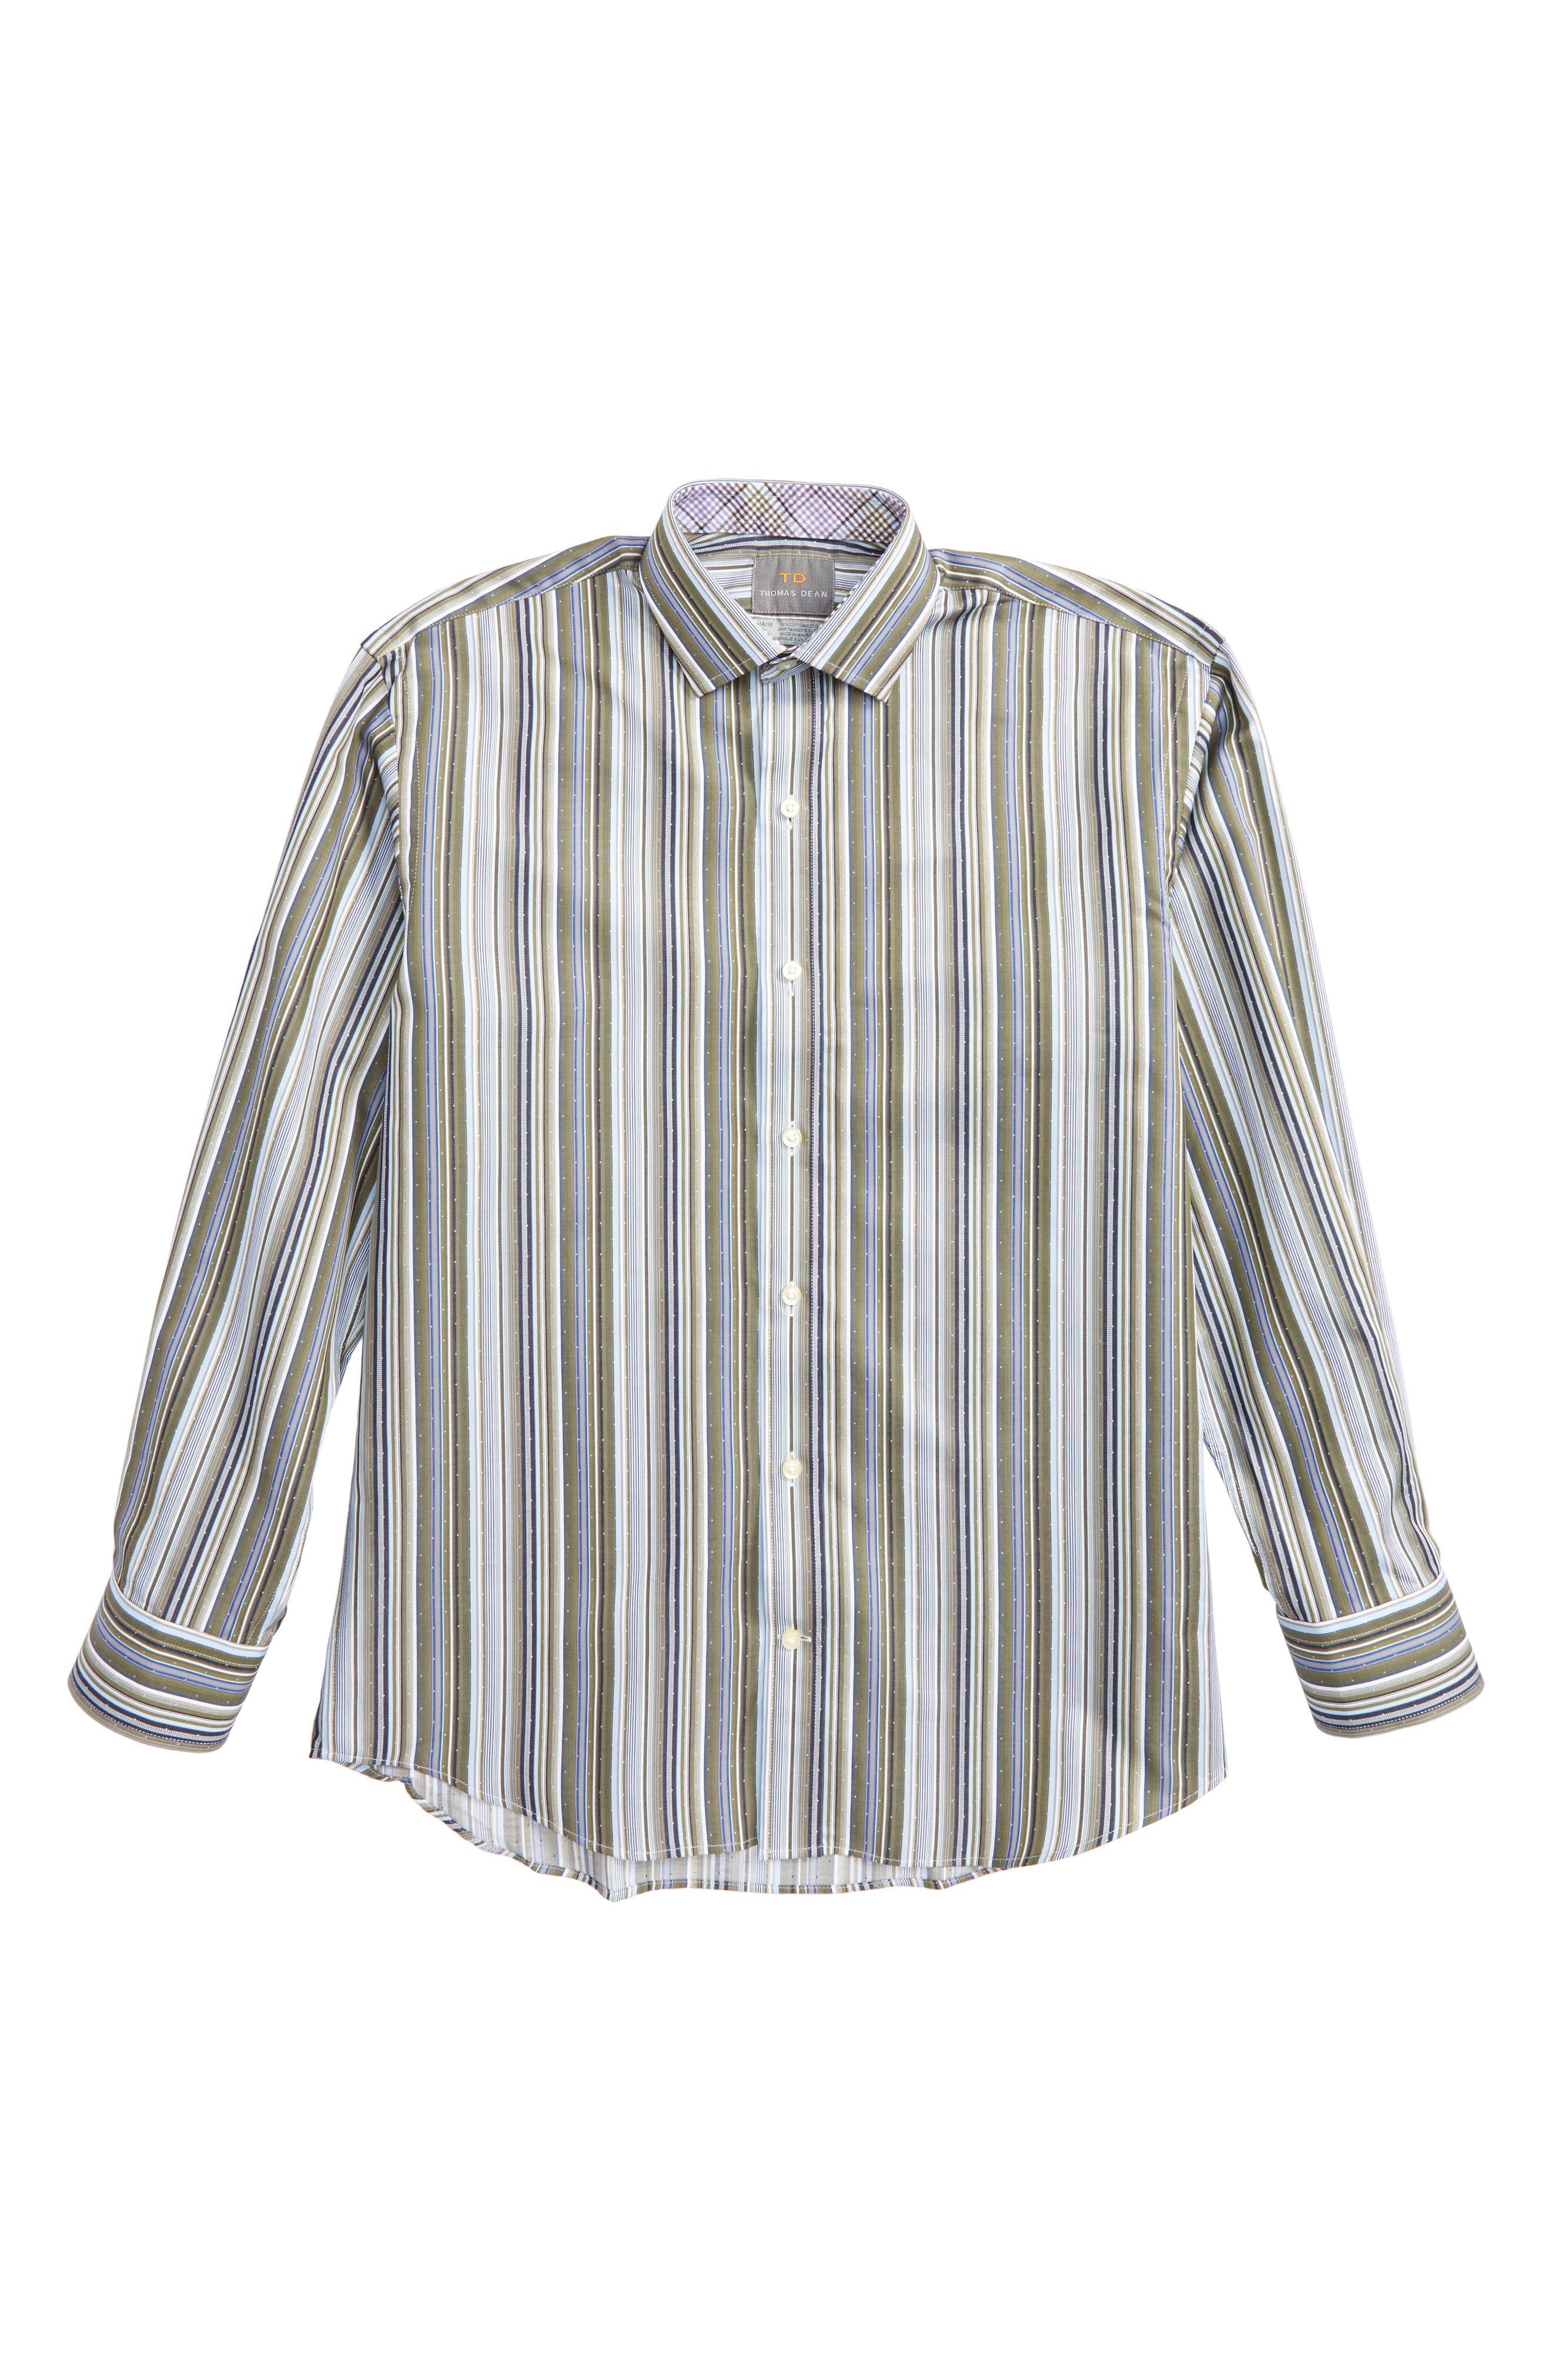 Alternate Image 1 Selected - Thomas Dean Stripe Dress Shirt (Big Boys)